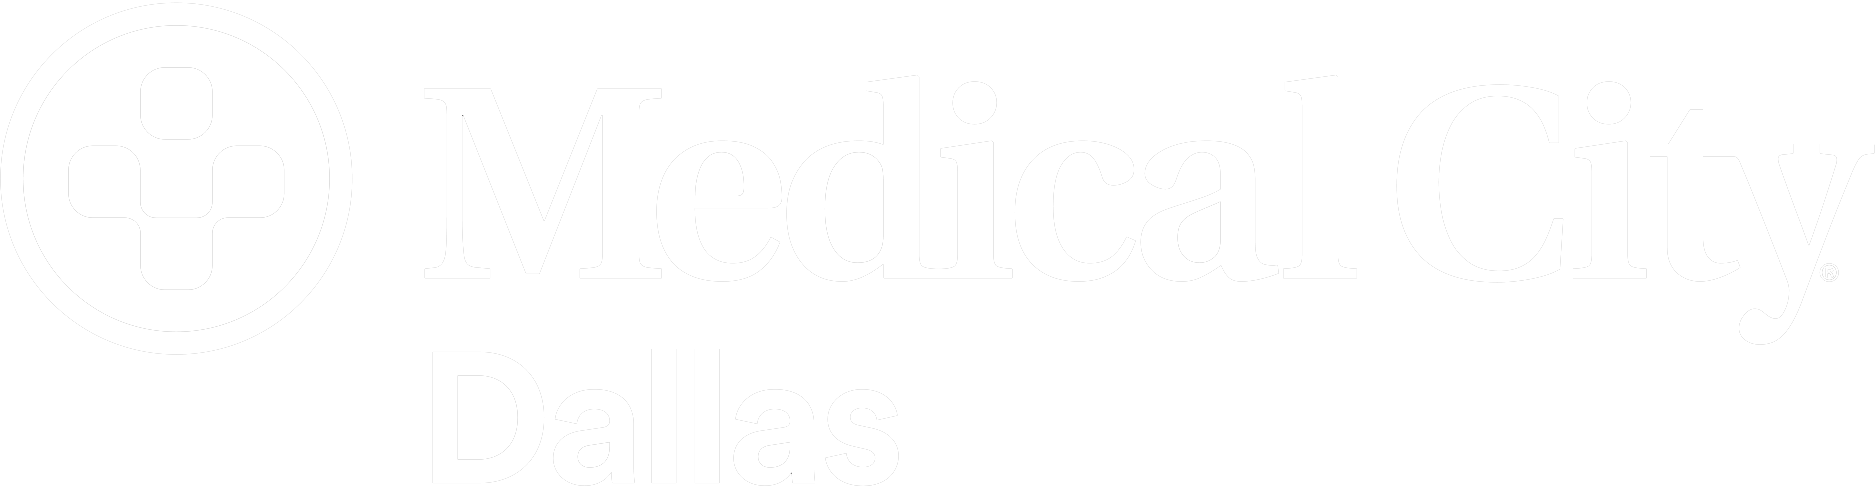 Medical City Dallas Hospital - Dallas, TX | Medical City Dallas